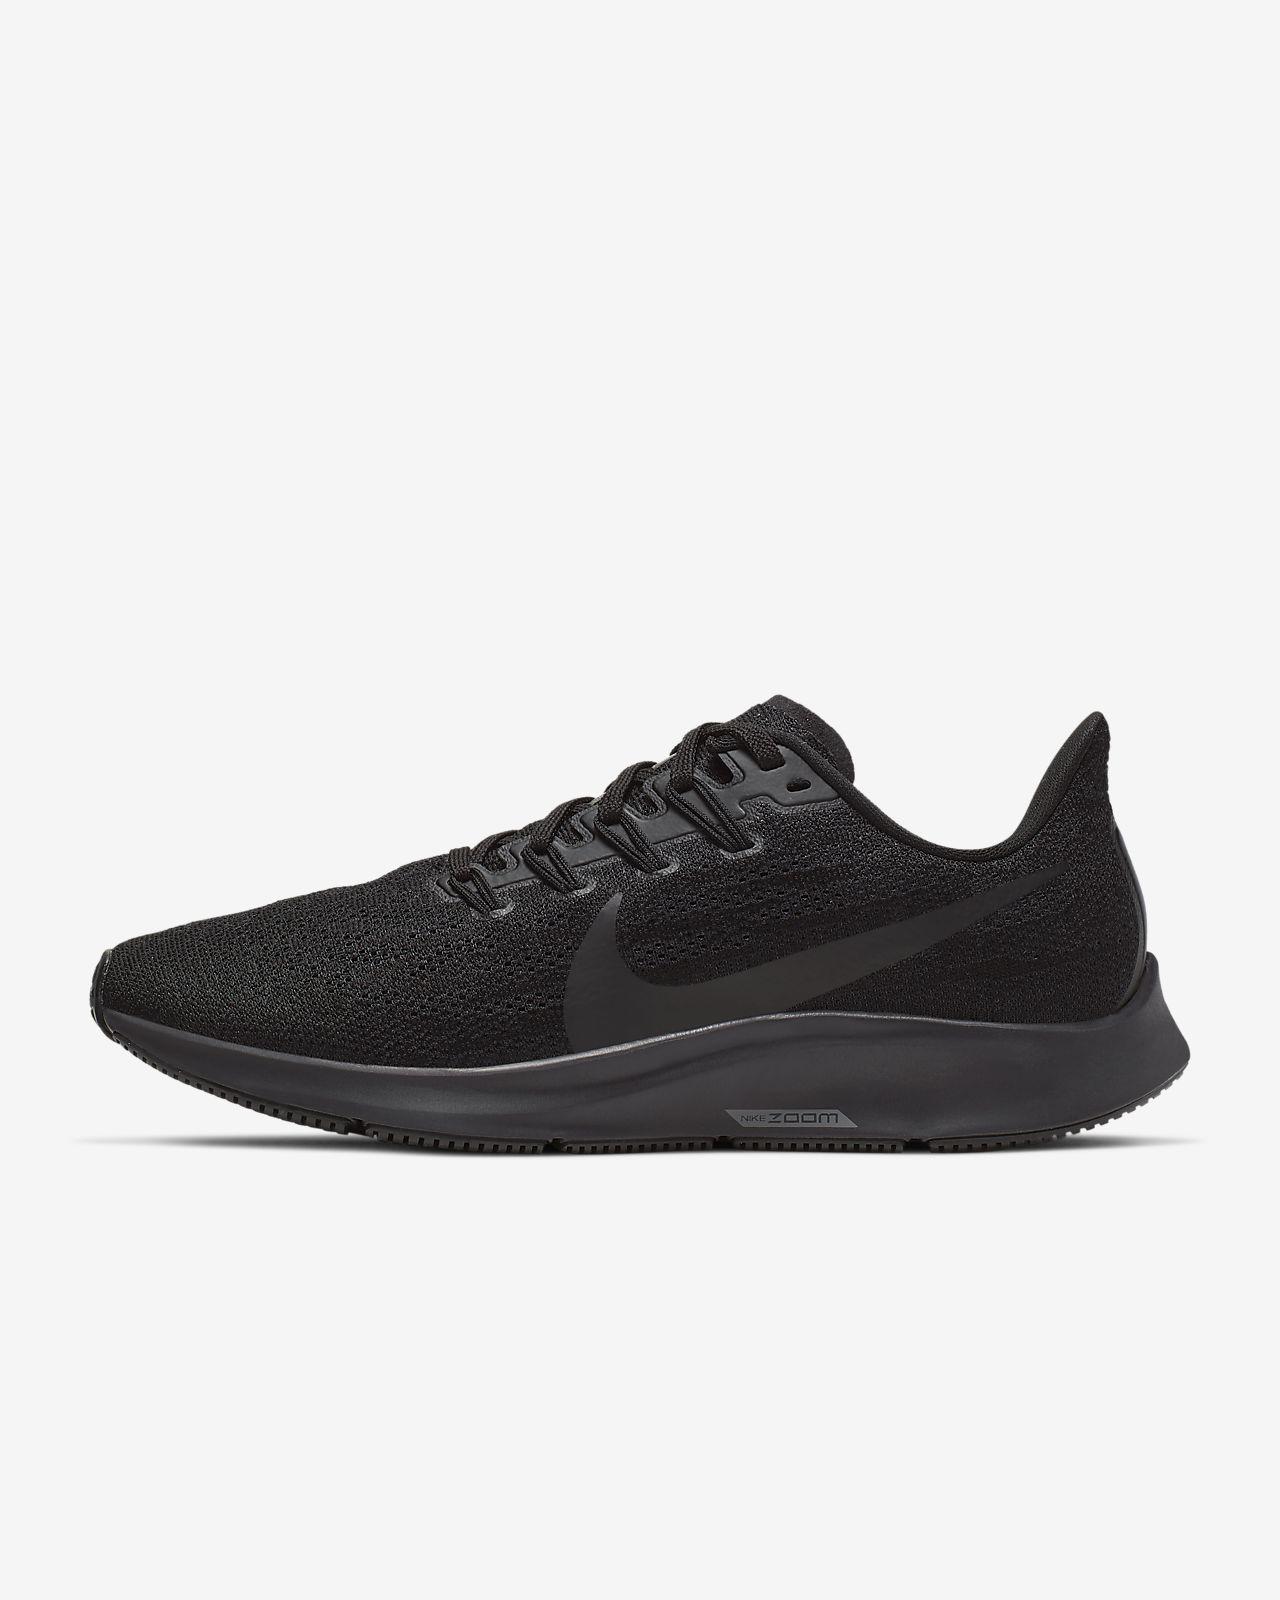 Löparsko Nike Air Zoom Pegasus 36 för kvinnor